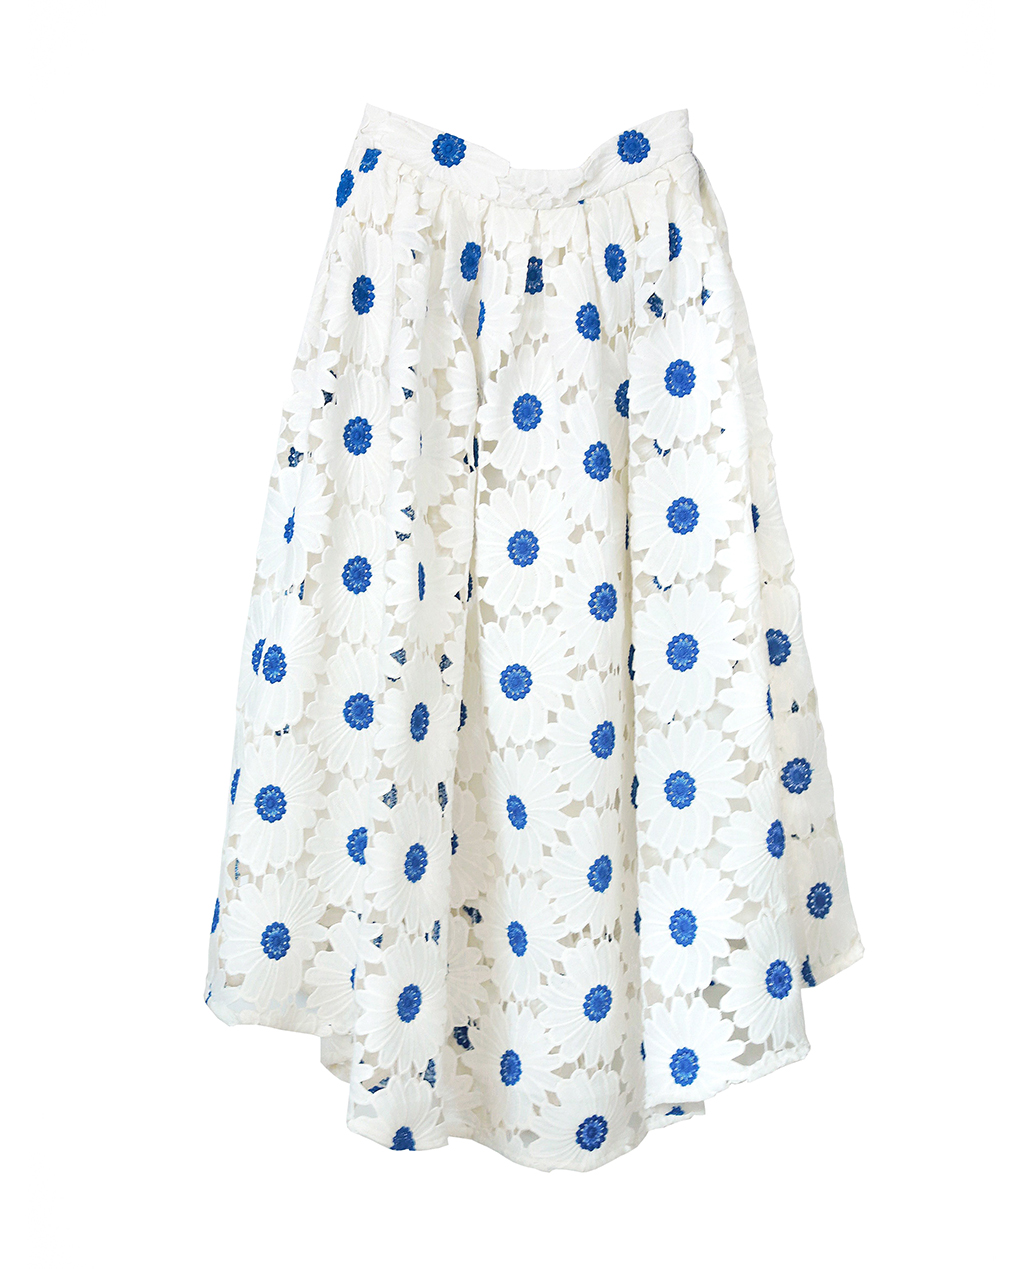 Blue Daisy Embroidered Midi Skirt (M)